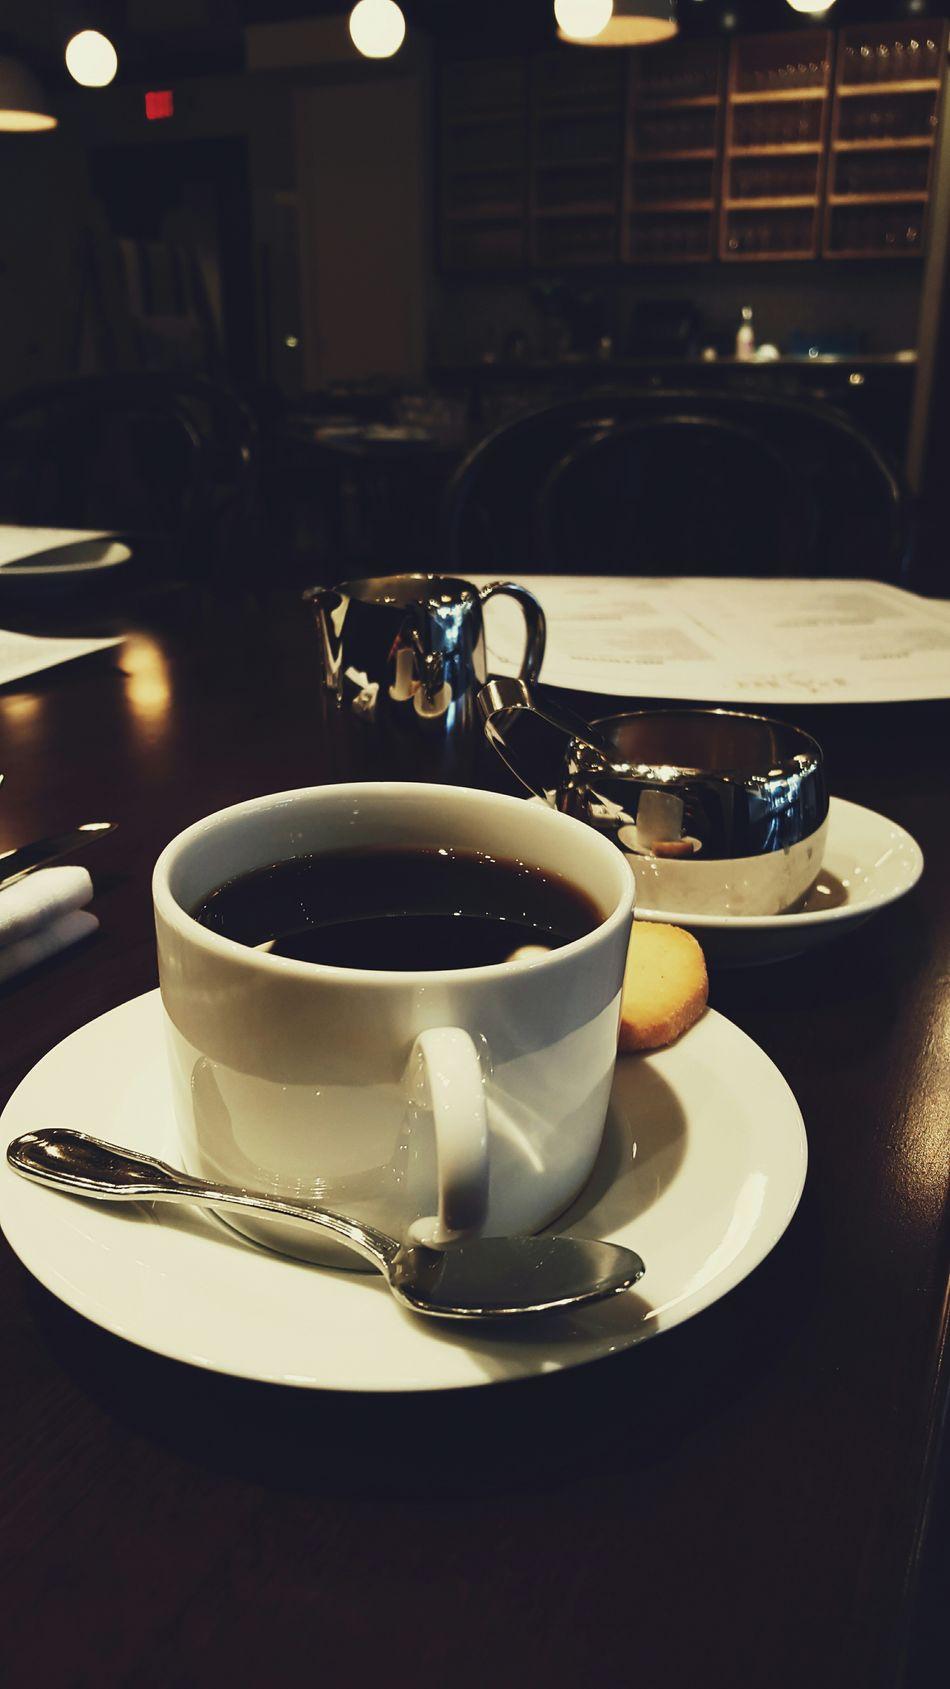 EyeEm Best Shots Cafe VSCO Cam Explore Brunch Coffee